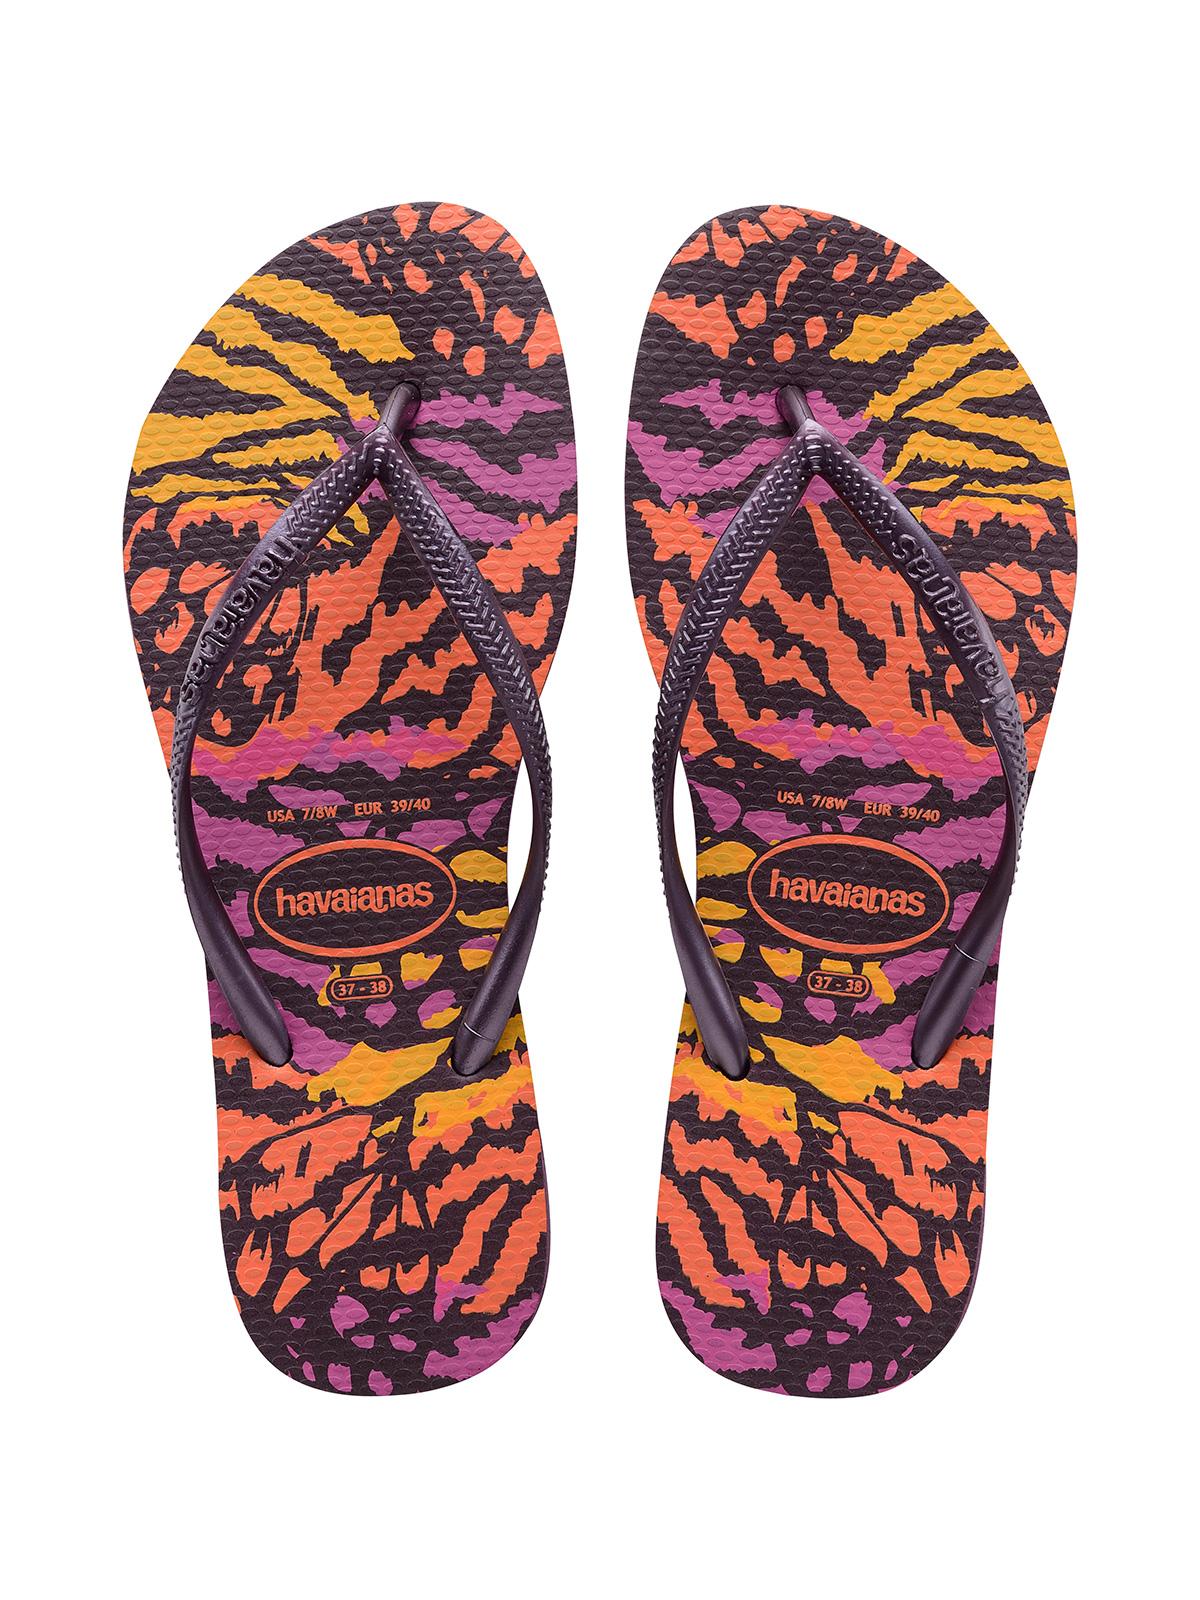 e56b12ffaa63 Flip-Flops Colorful Animal Print Flip Flops - Slim Animals Aubergine